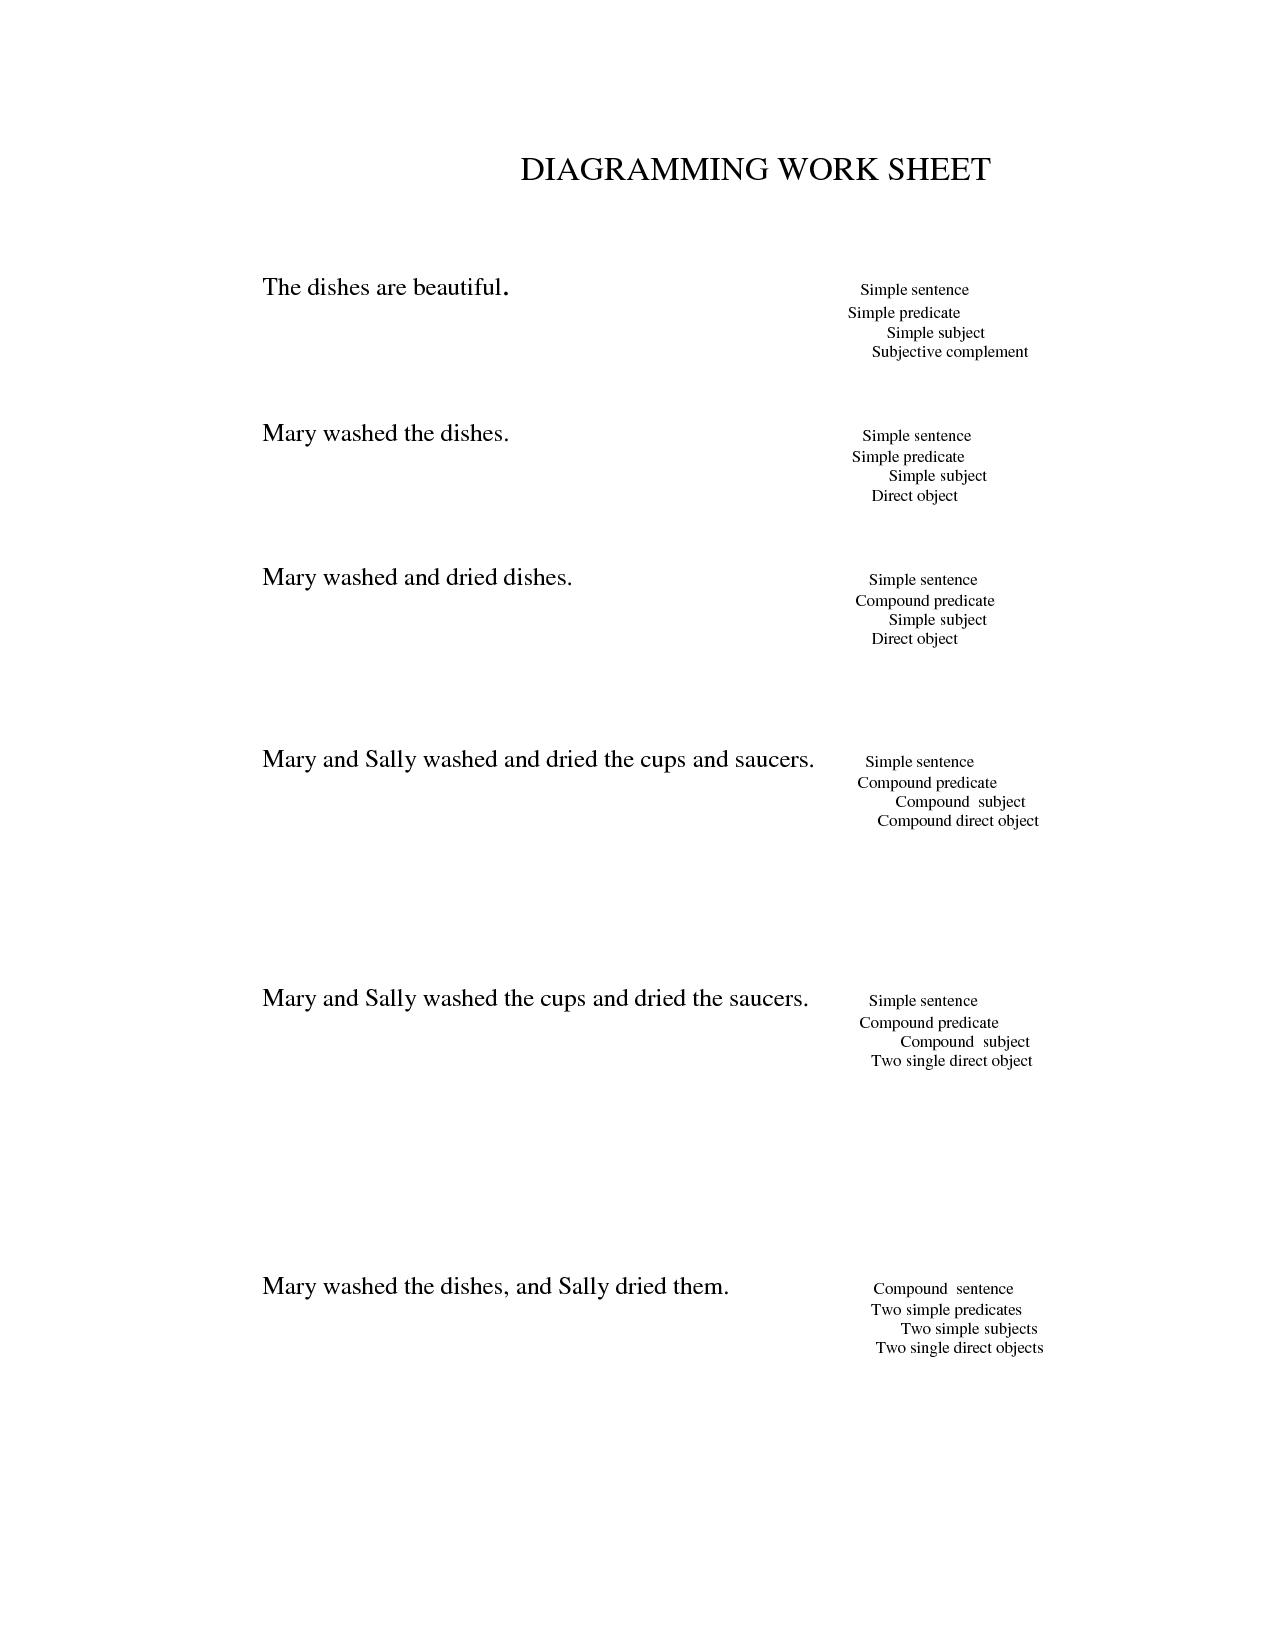 Diagramming Sentences Practice Worksheets | Free Worksheet - Free Printable Sentence Diagramming Worksheets